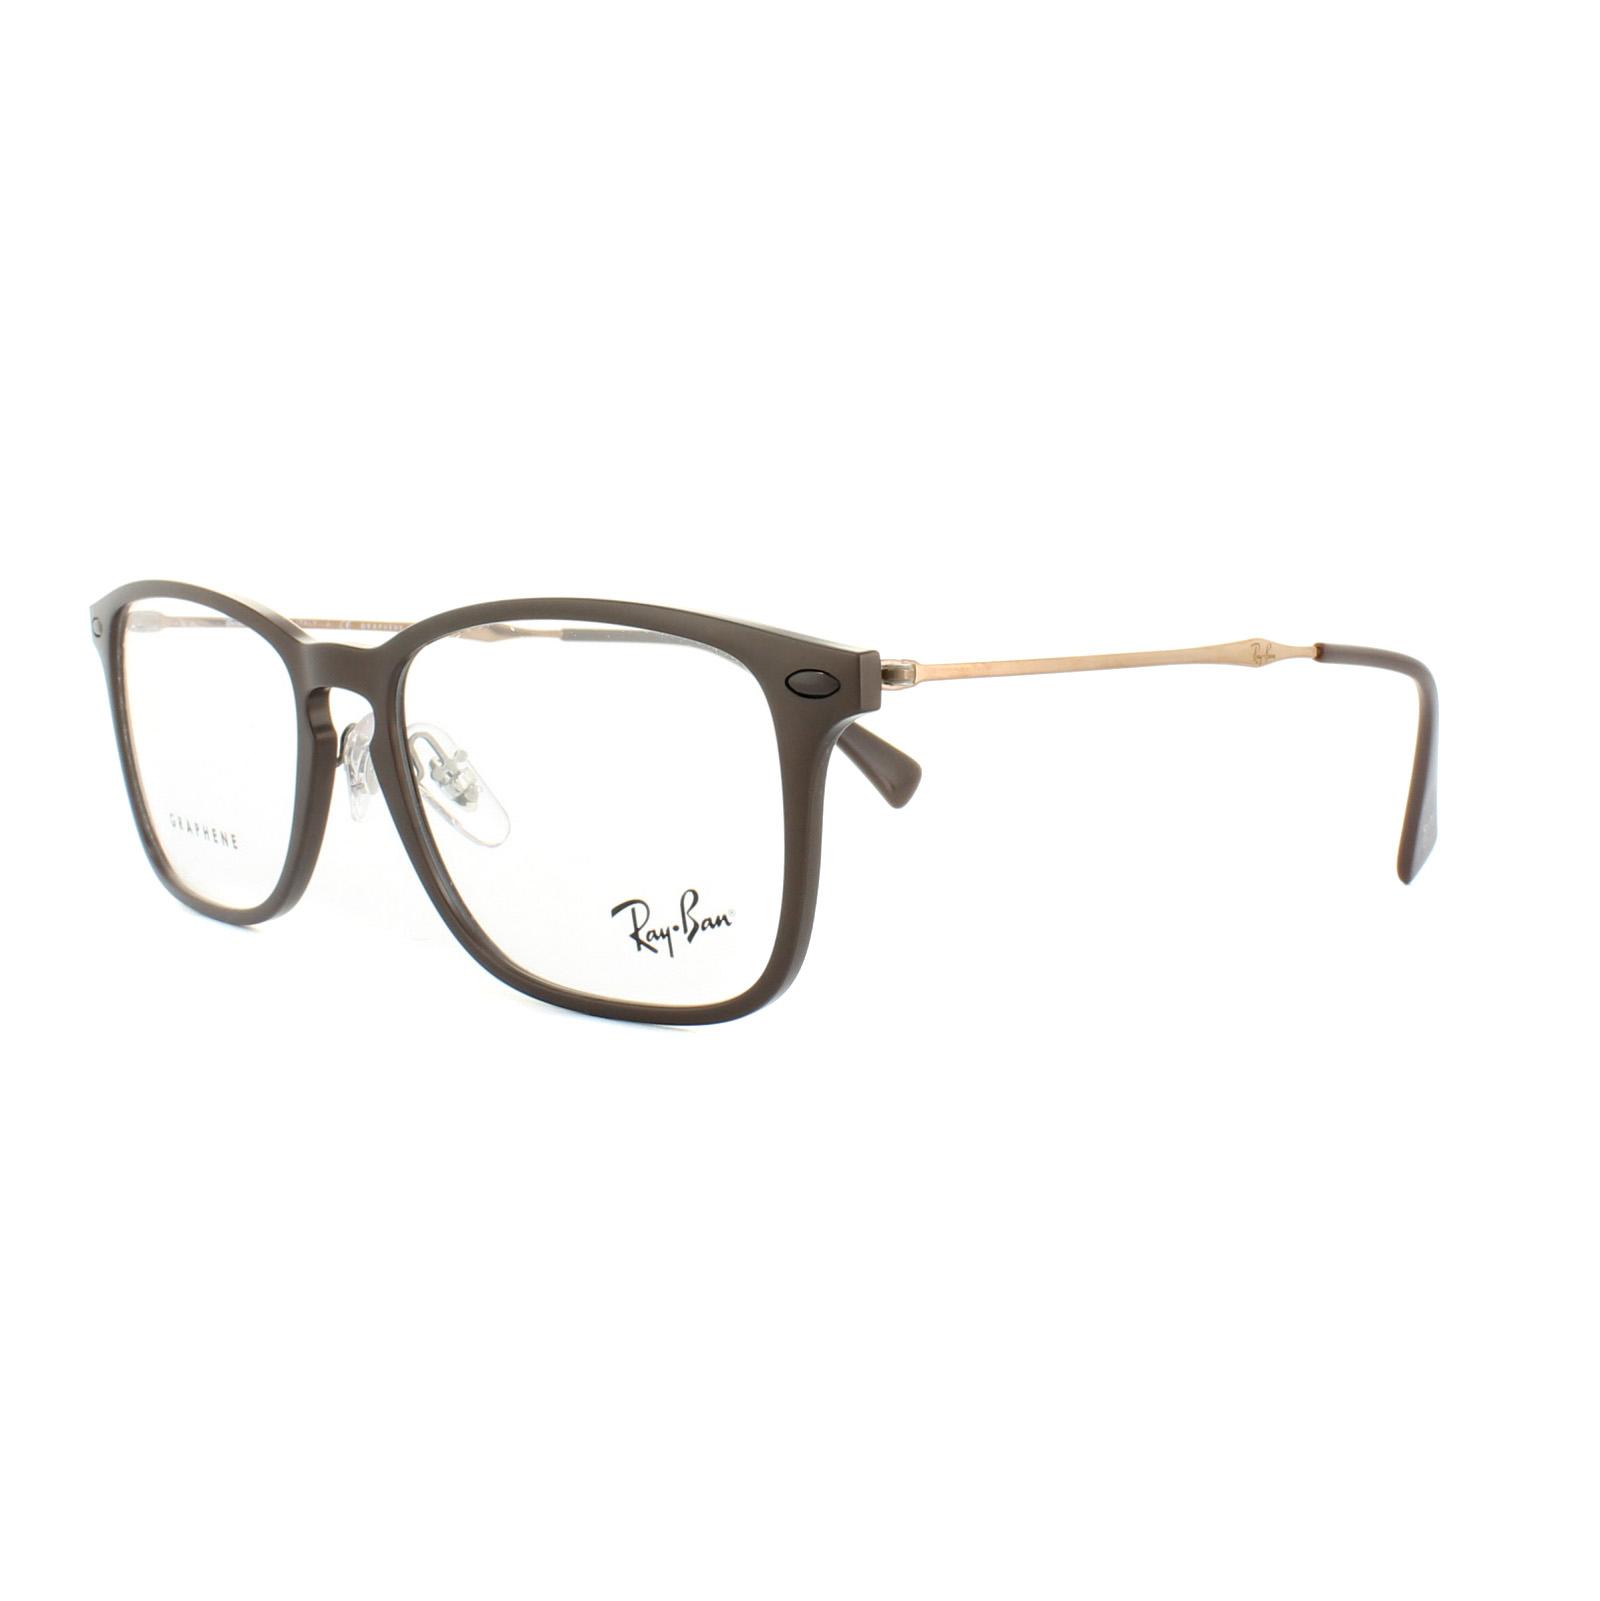 cd2ebc259a Sentinel Ray-Ban Glasses Frames RX 8953 8028 Brown Graphene Mens Womens 54mm